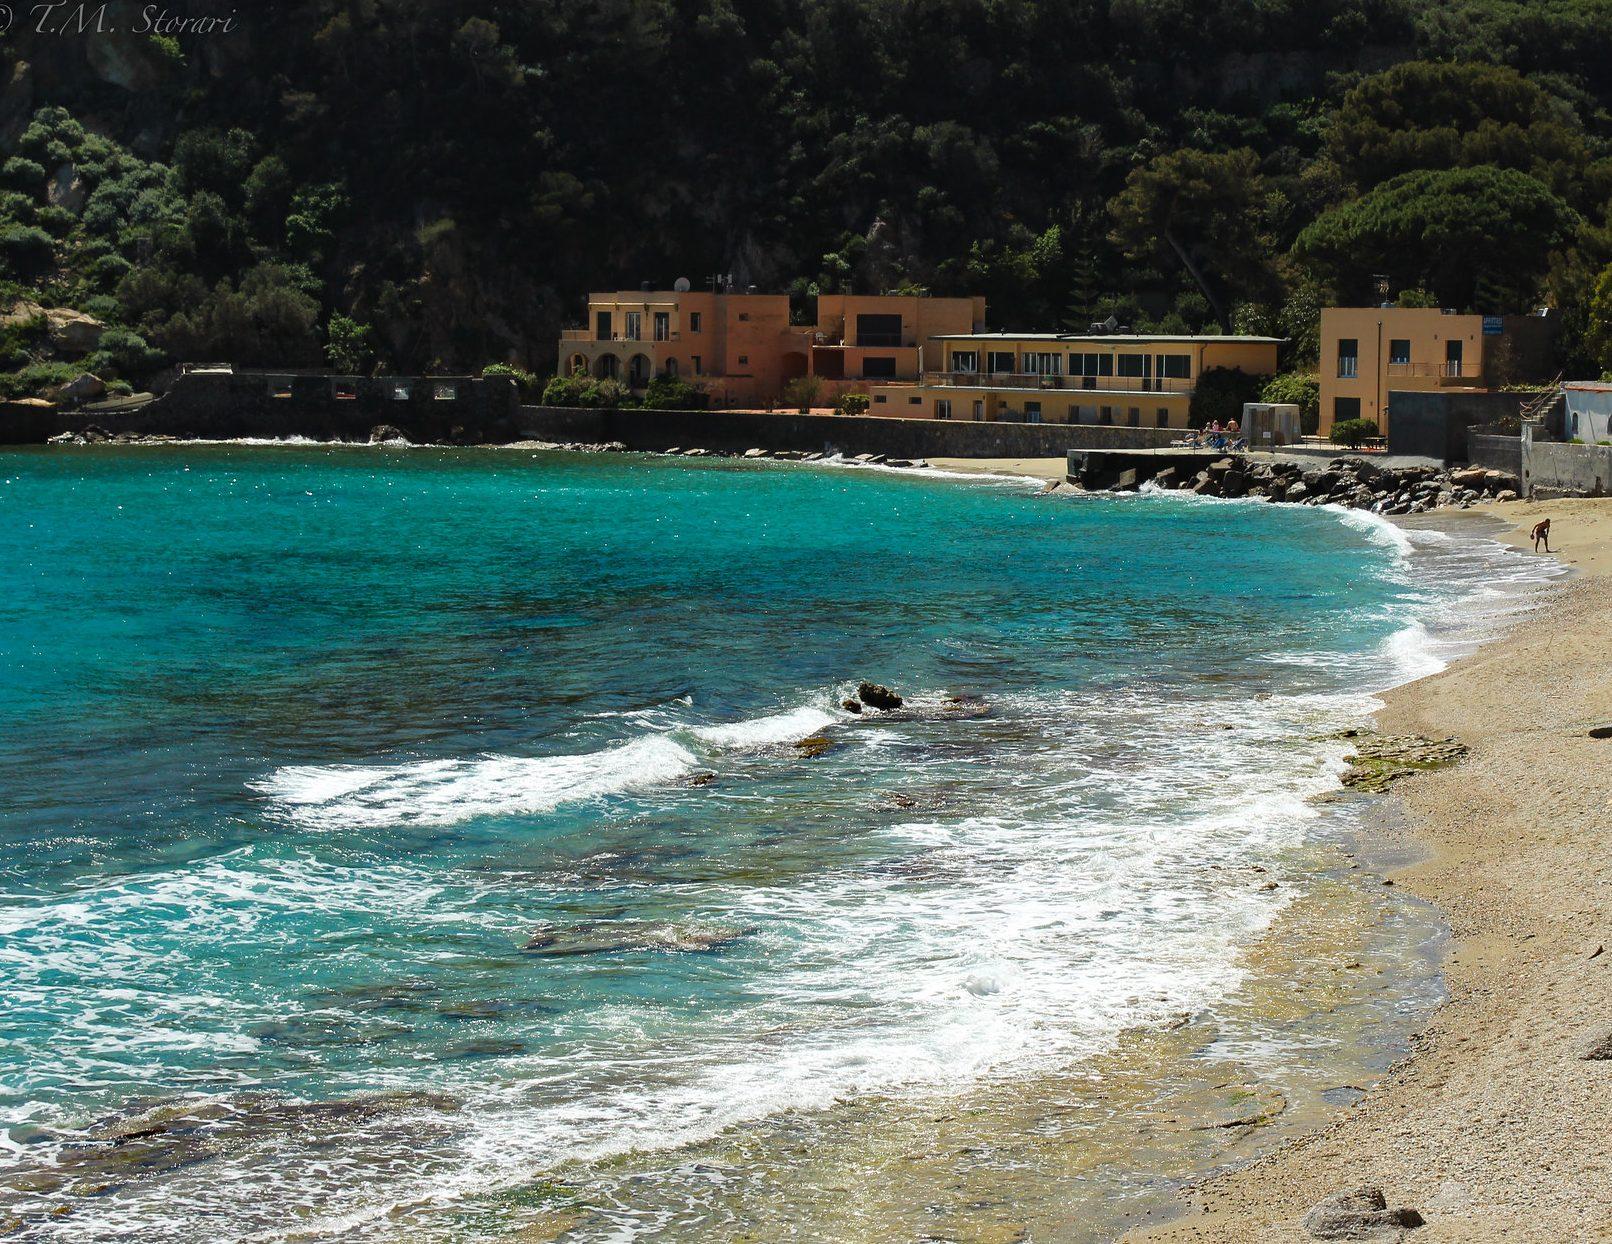 liguria spiagge libere